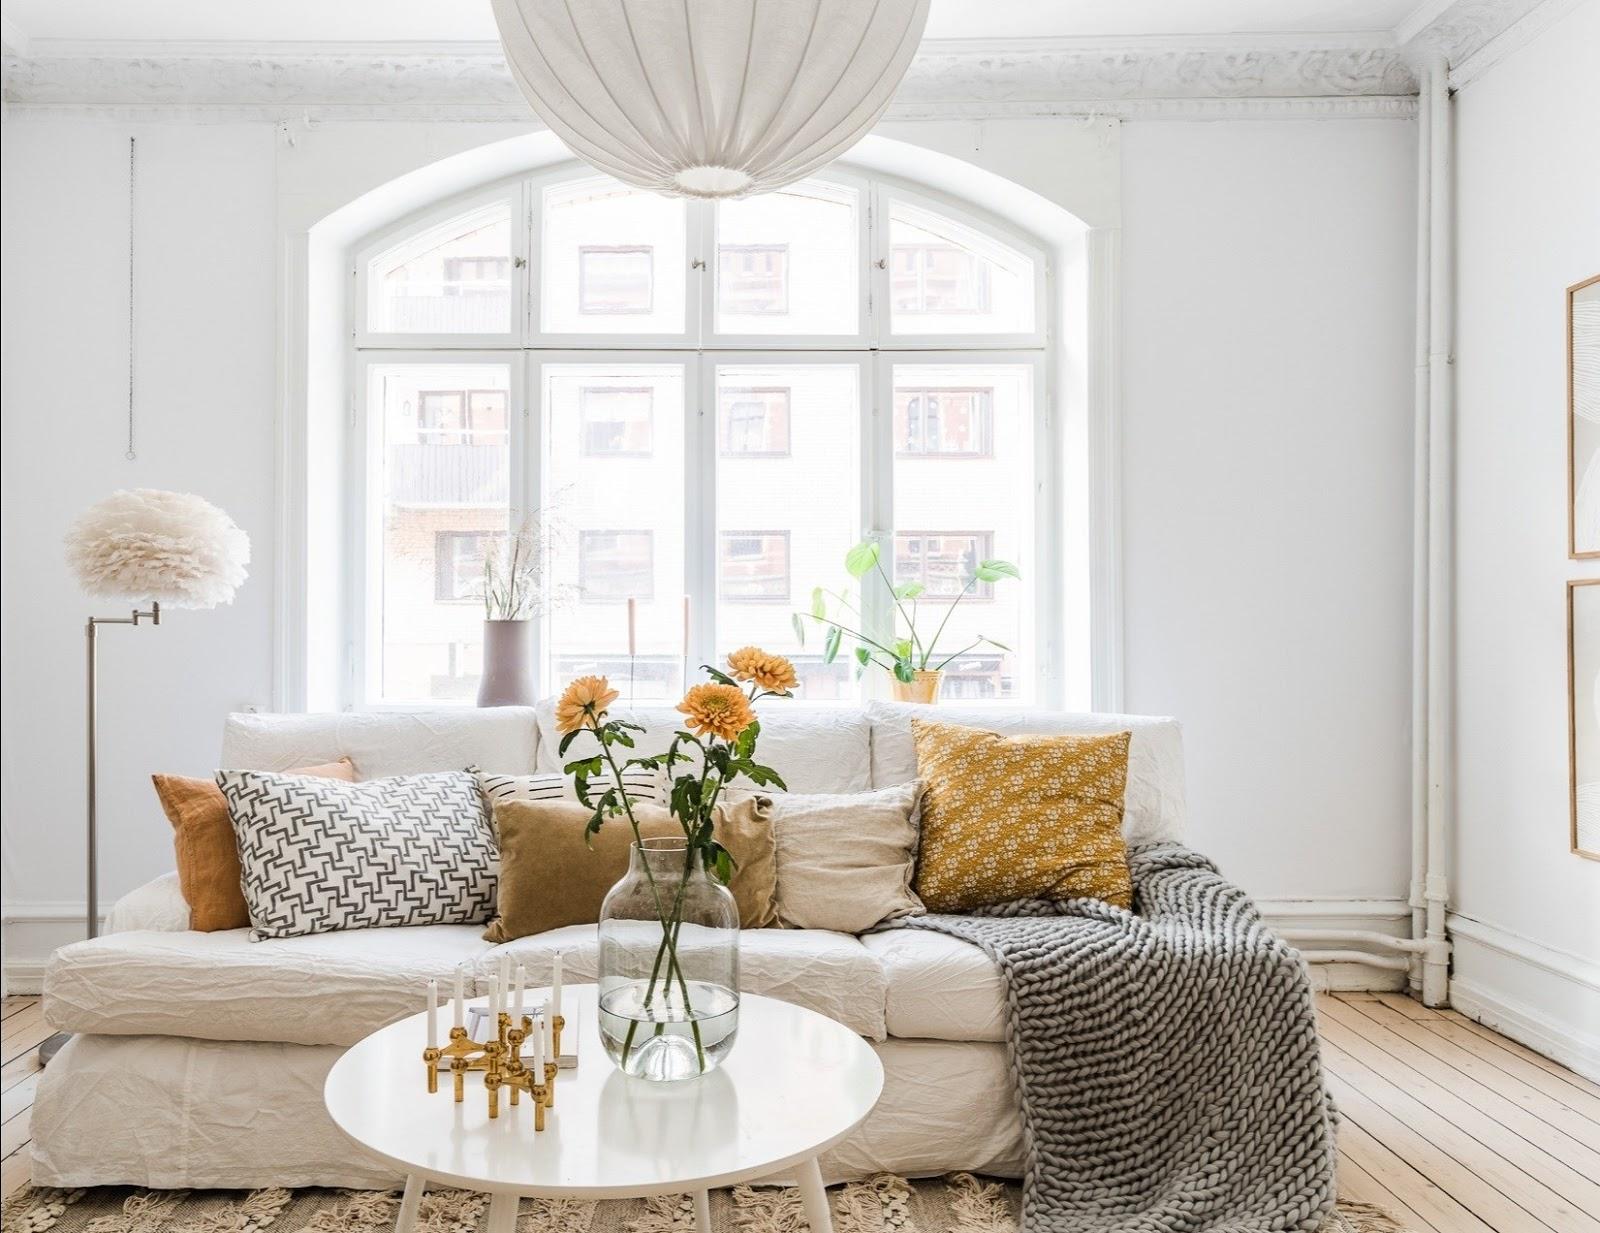 Spring spirit for a Scandinavian apartment